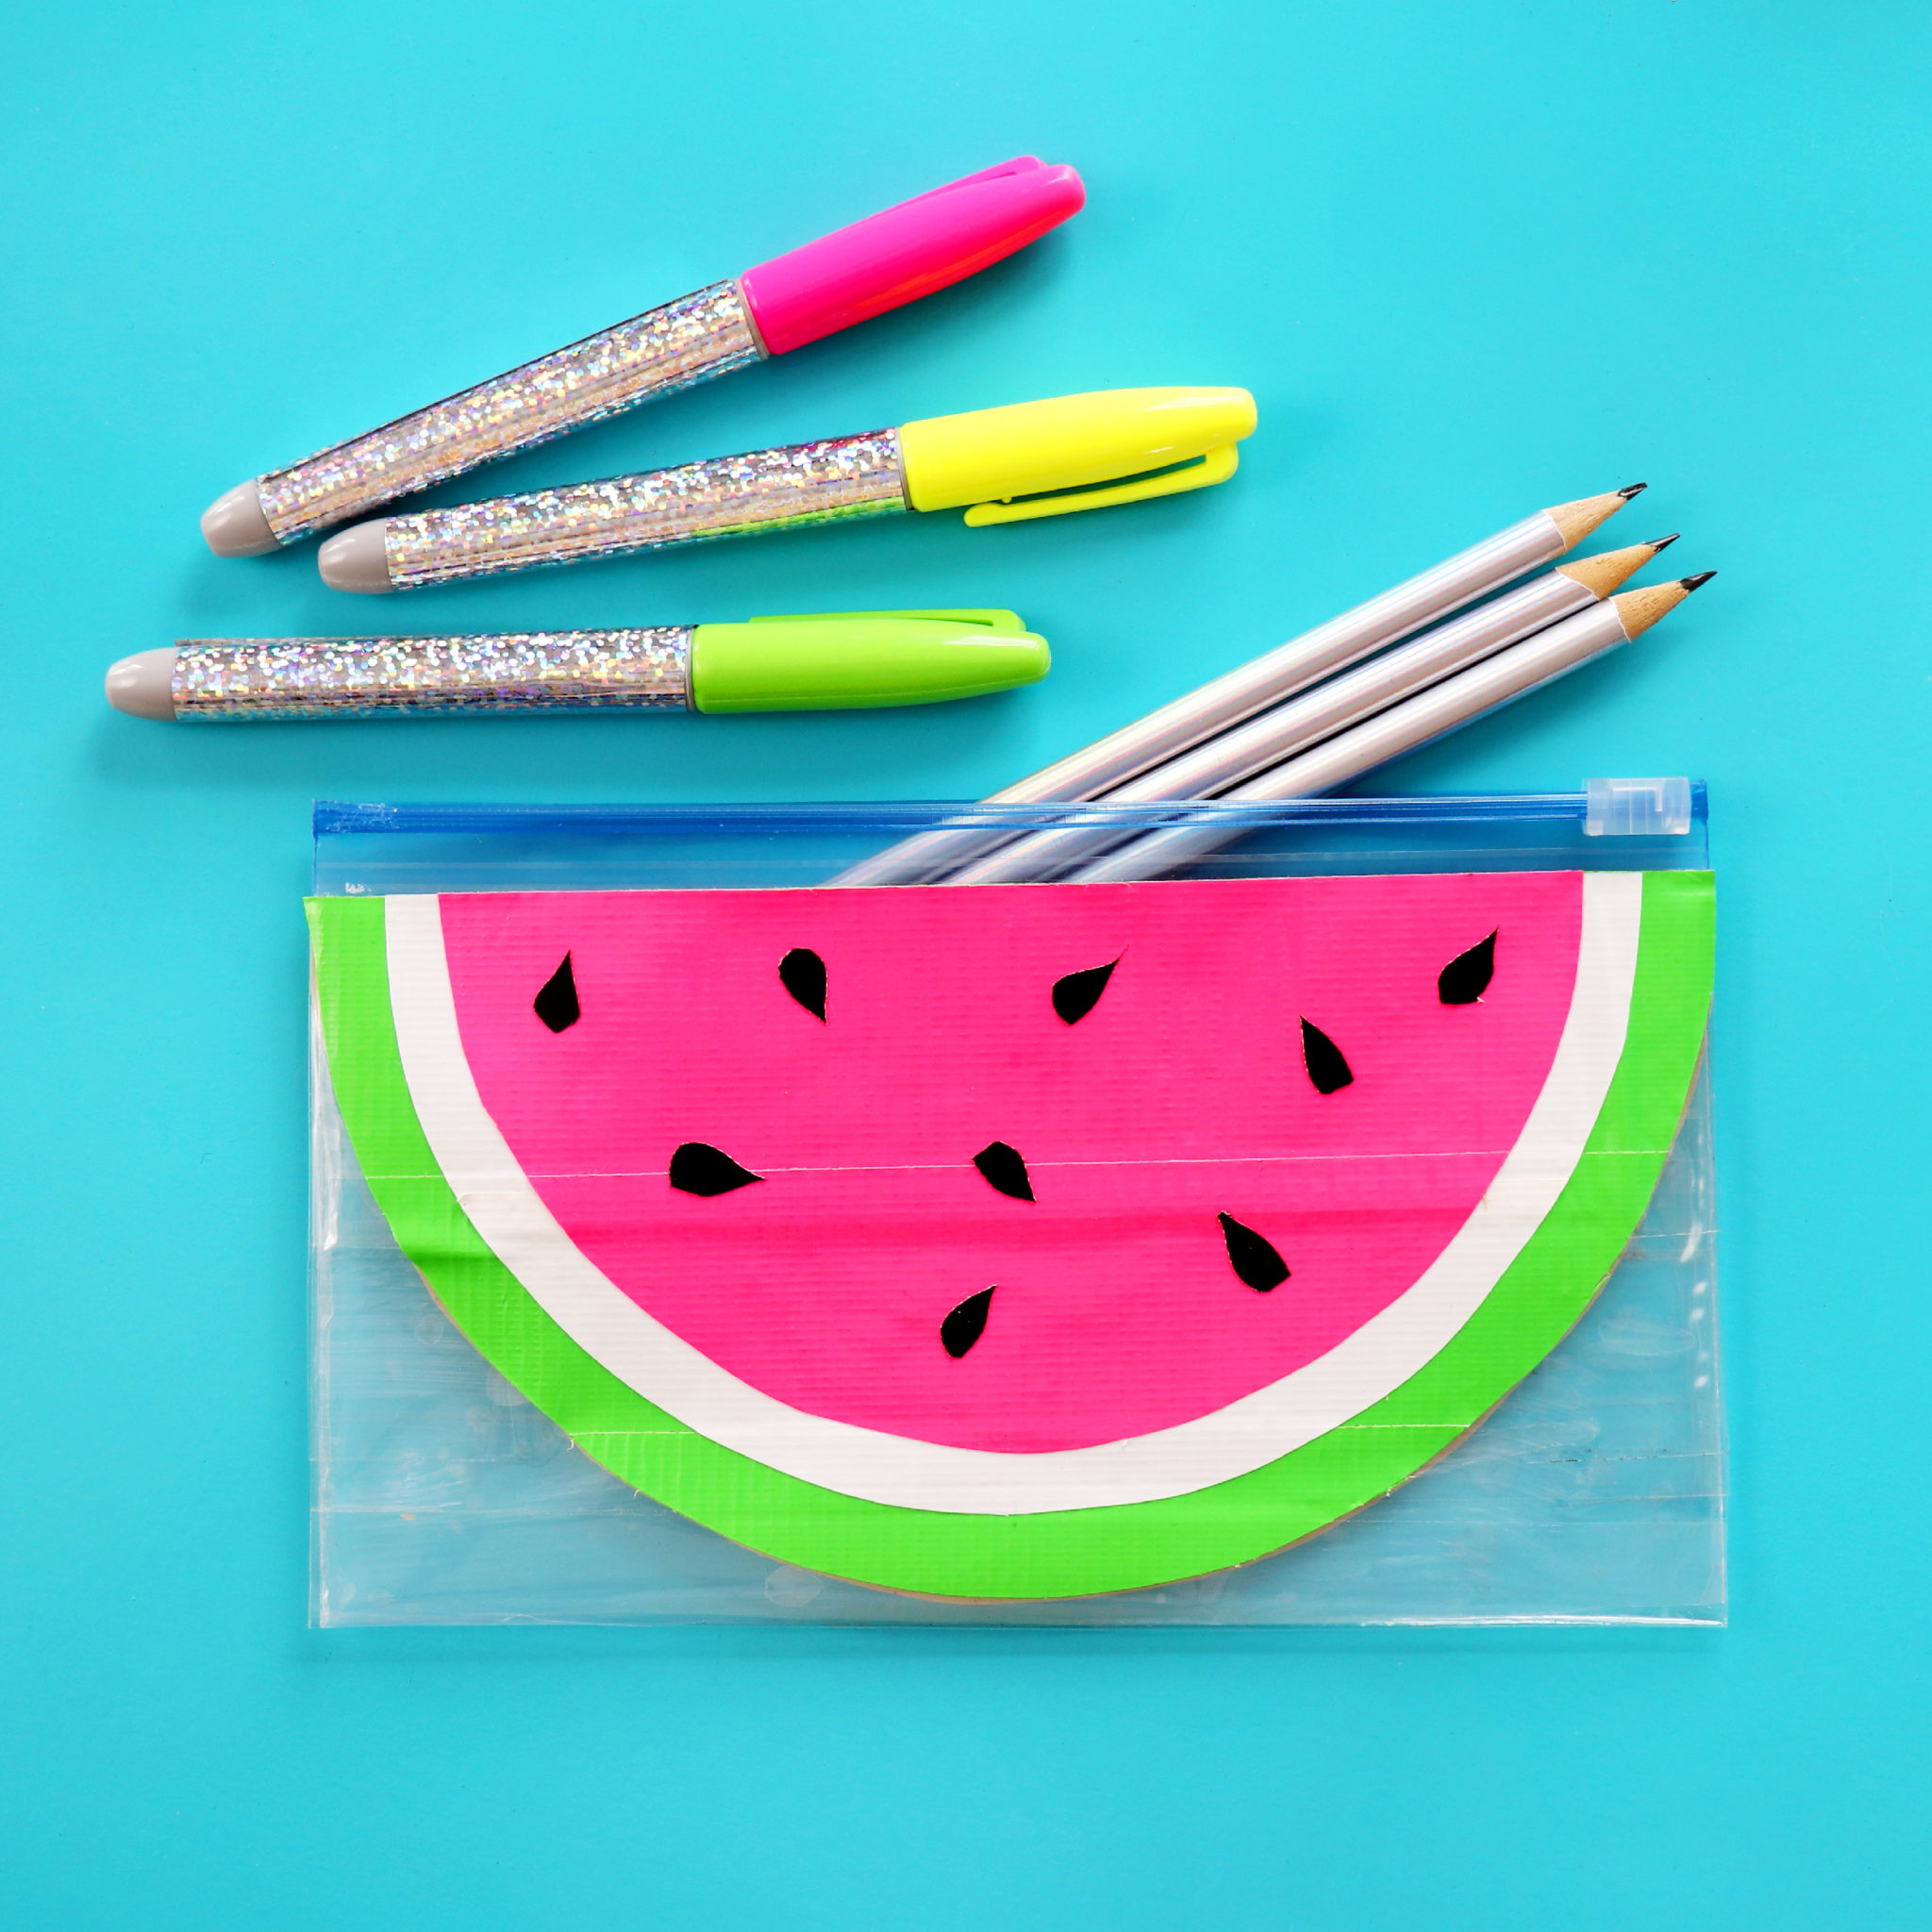 watermelon_on_table